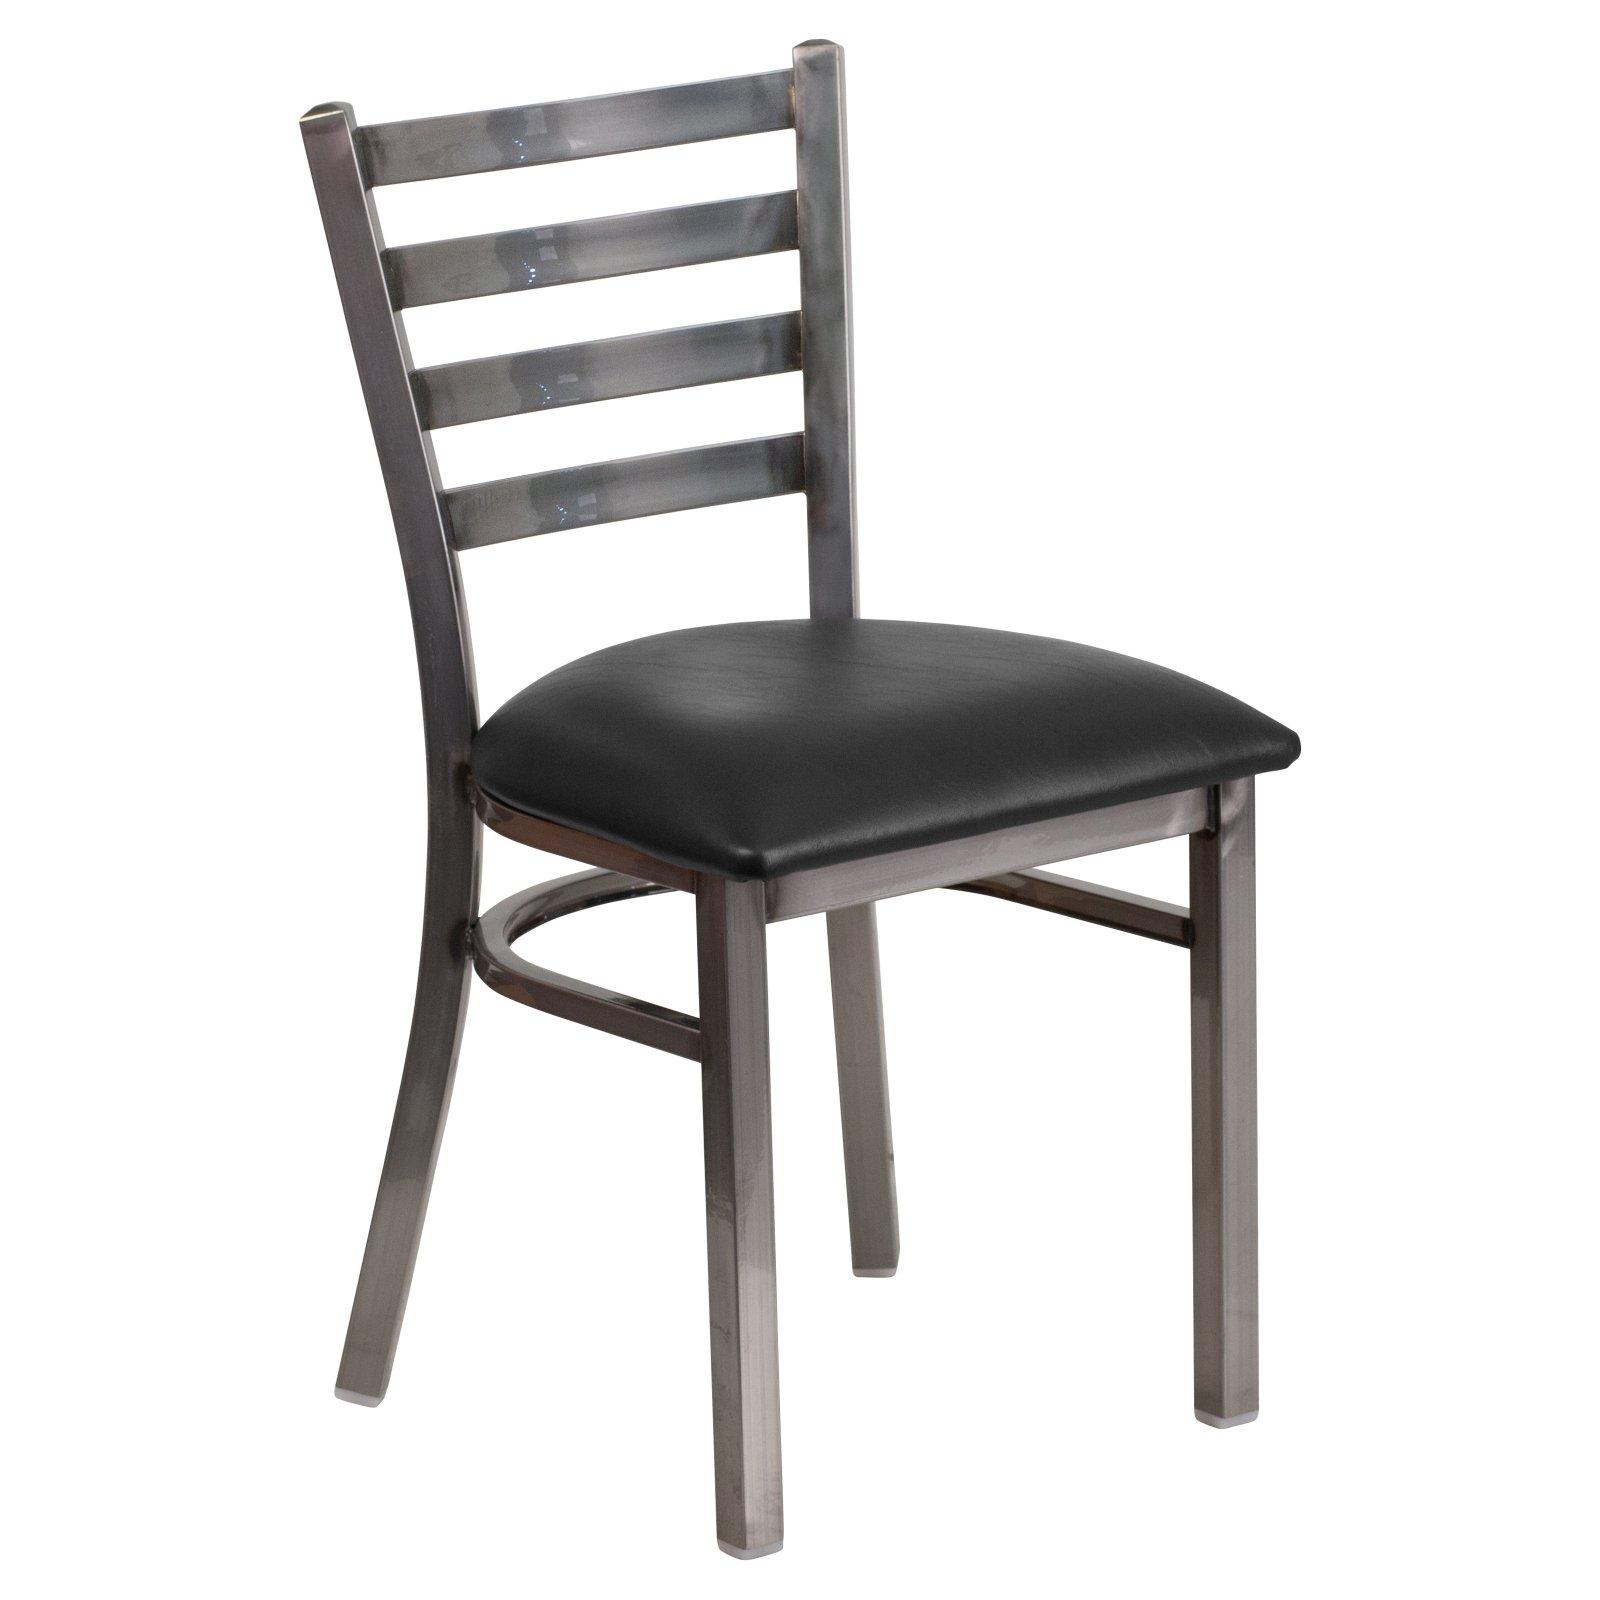 Flash Furniture HERCULES Series Clear Coated Ladder Back Metal Restaurant Chair - Vinyl Seat Multiple Colors